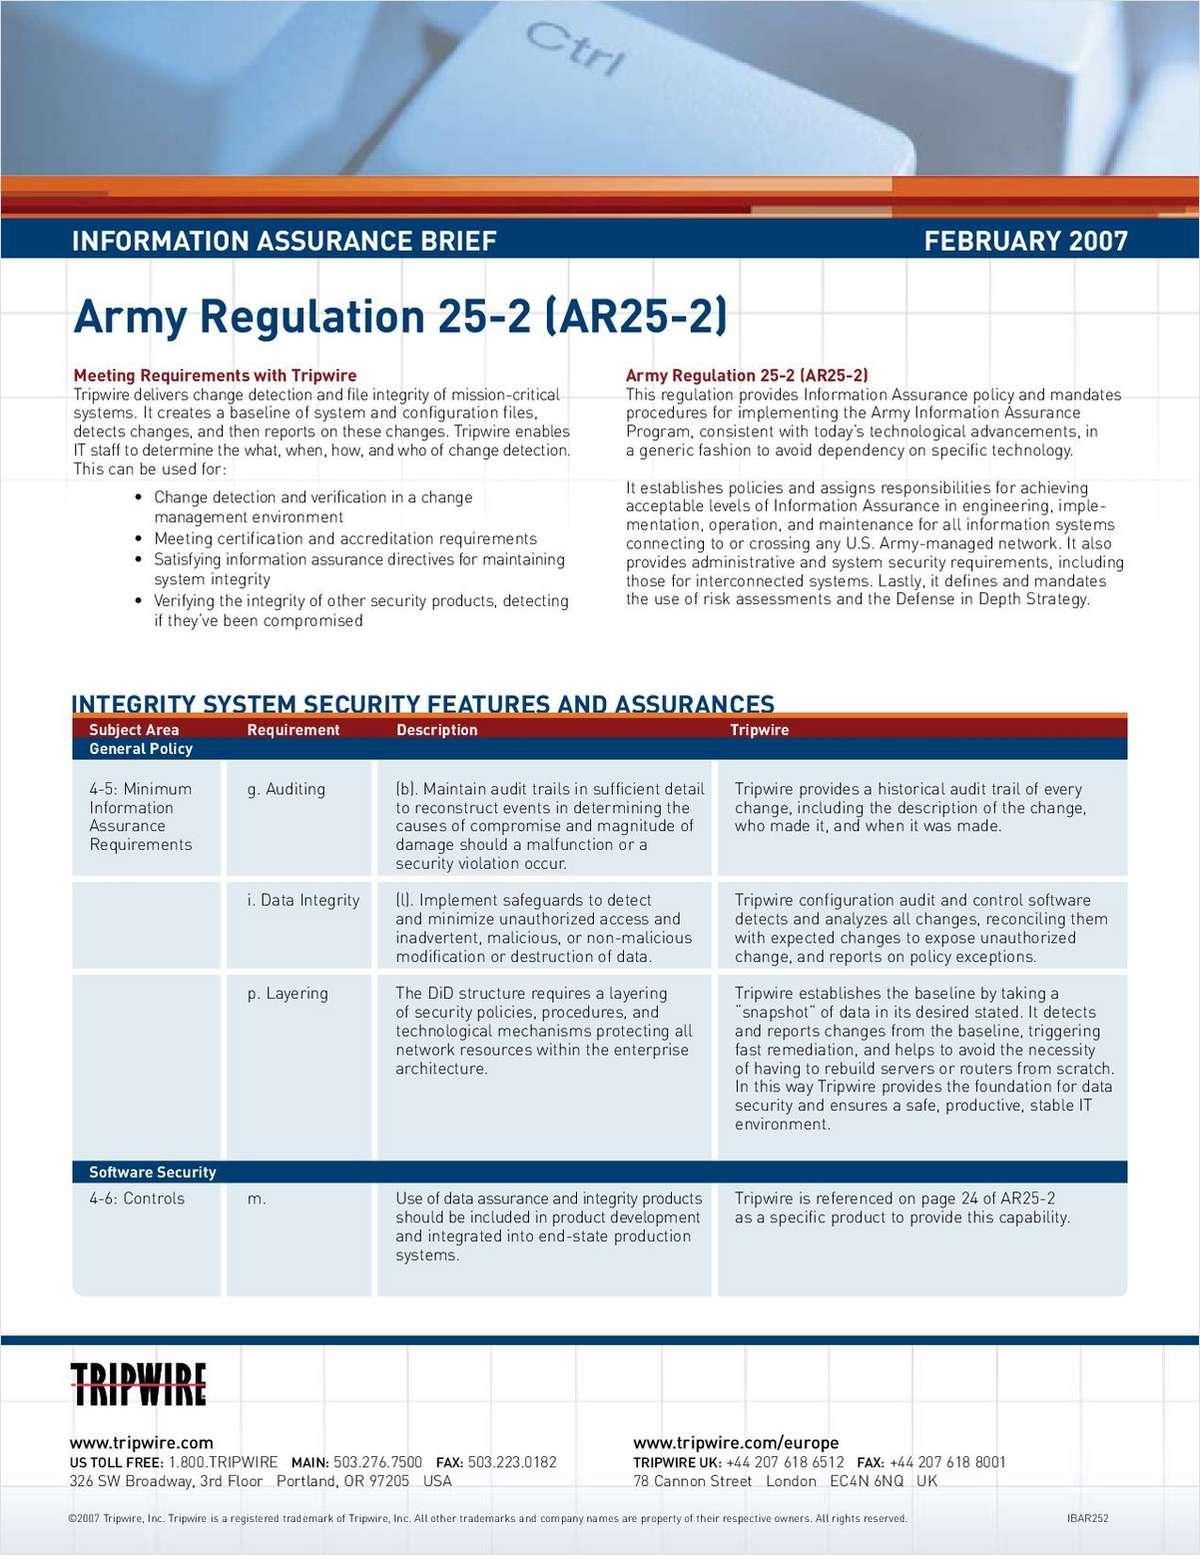 Department of Defense Information Assurance Briefs